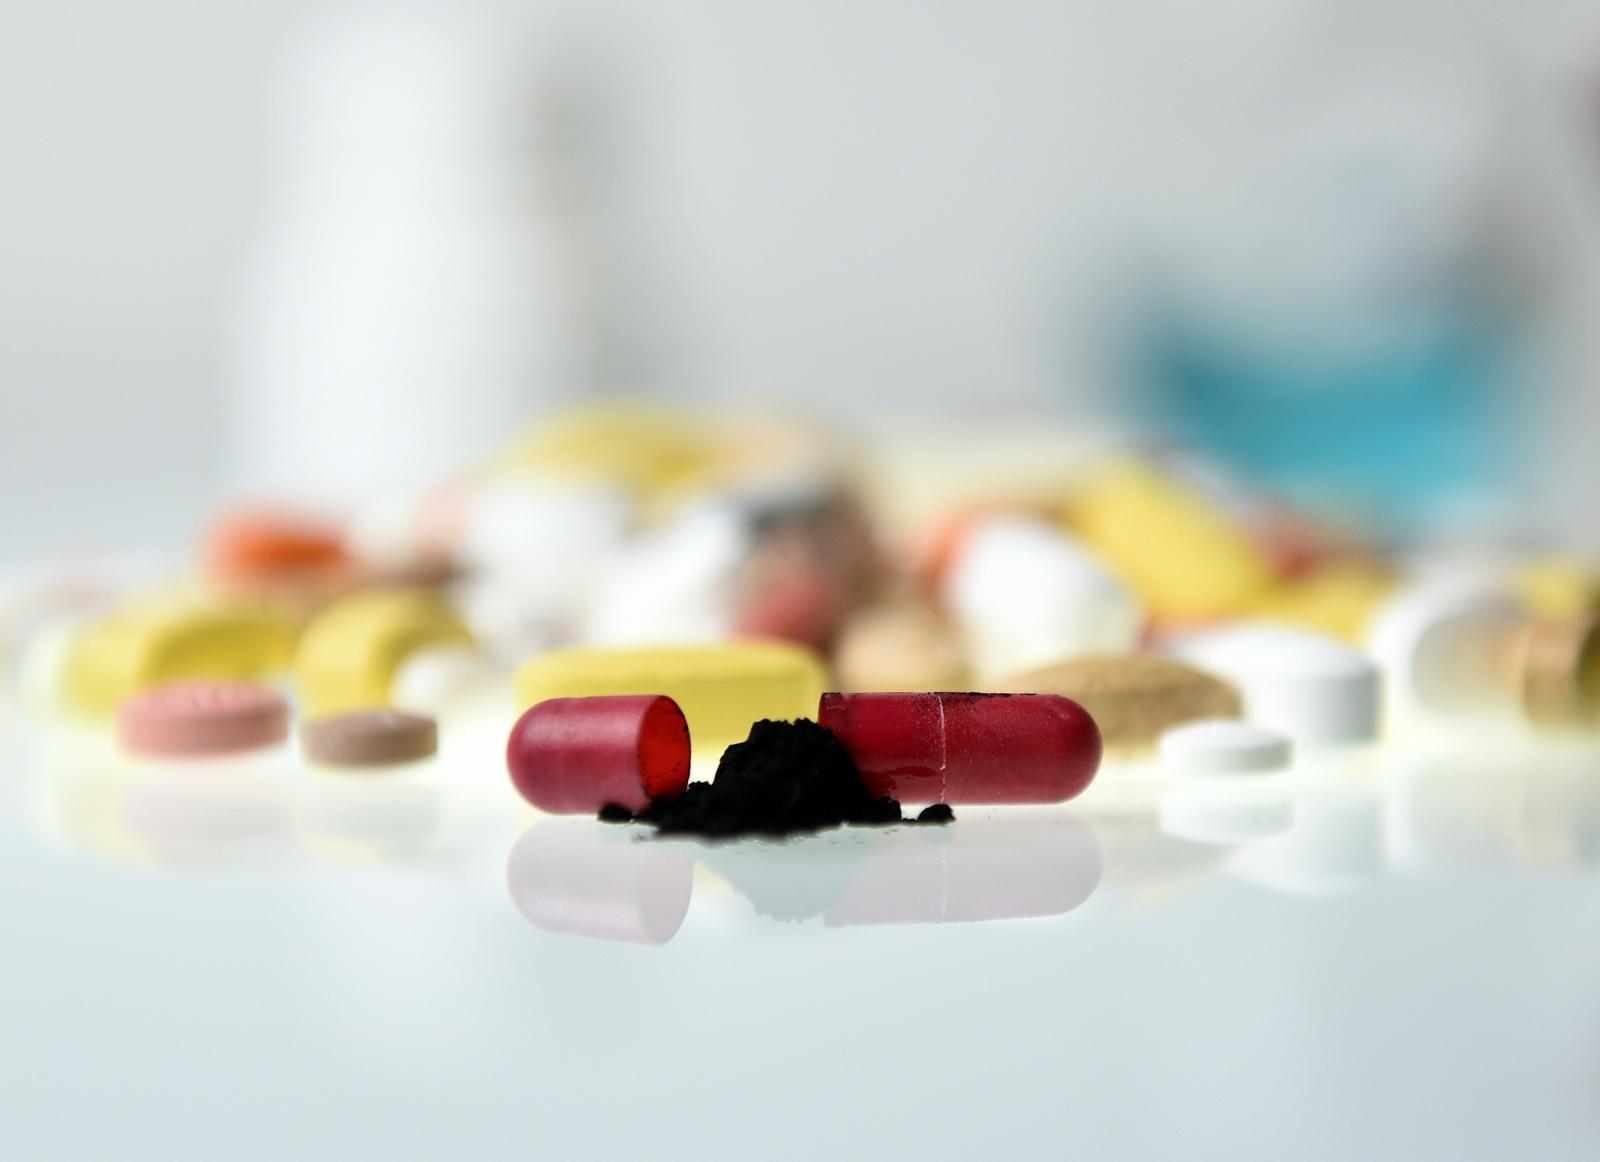 Poo pill